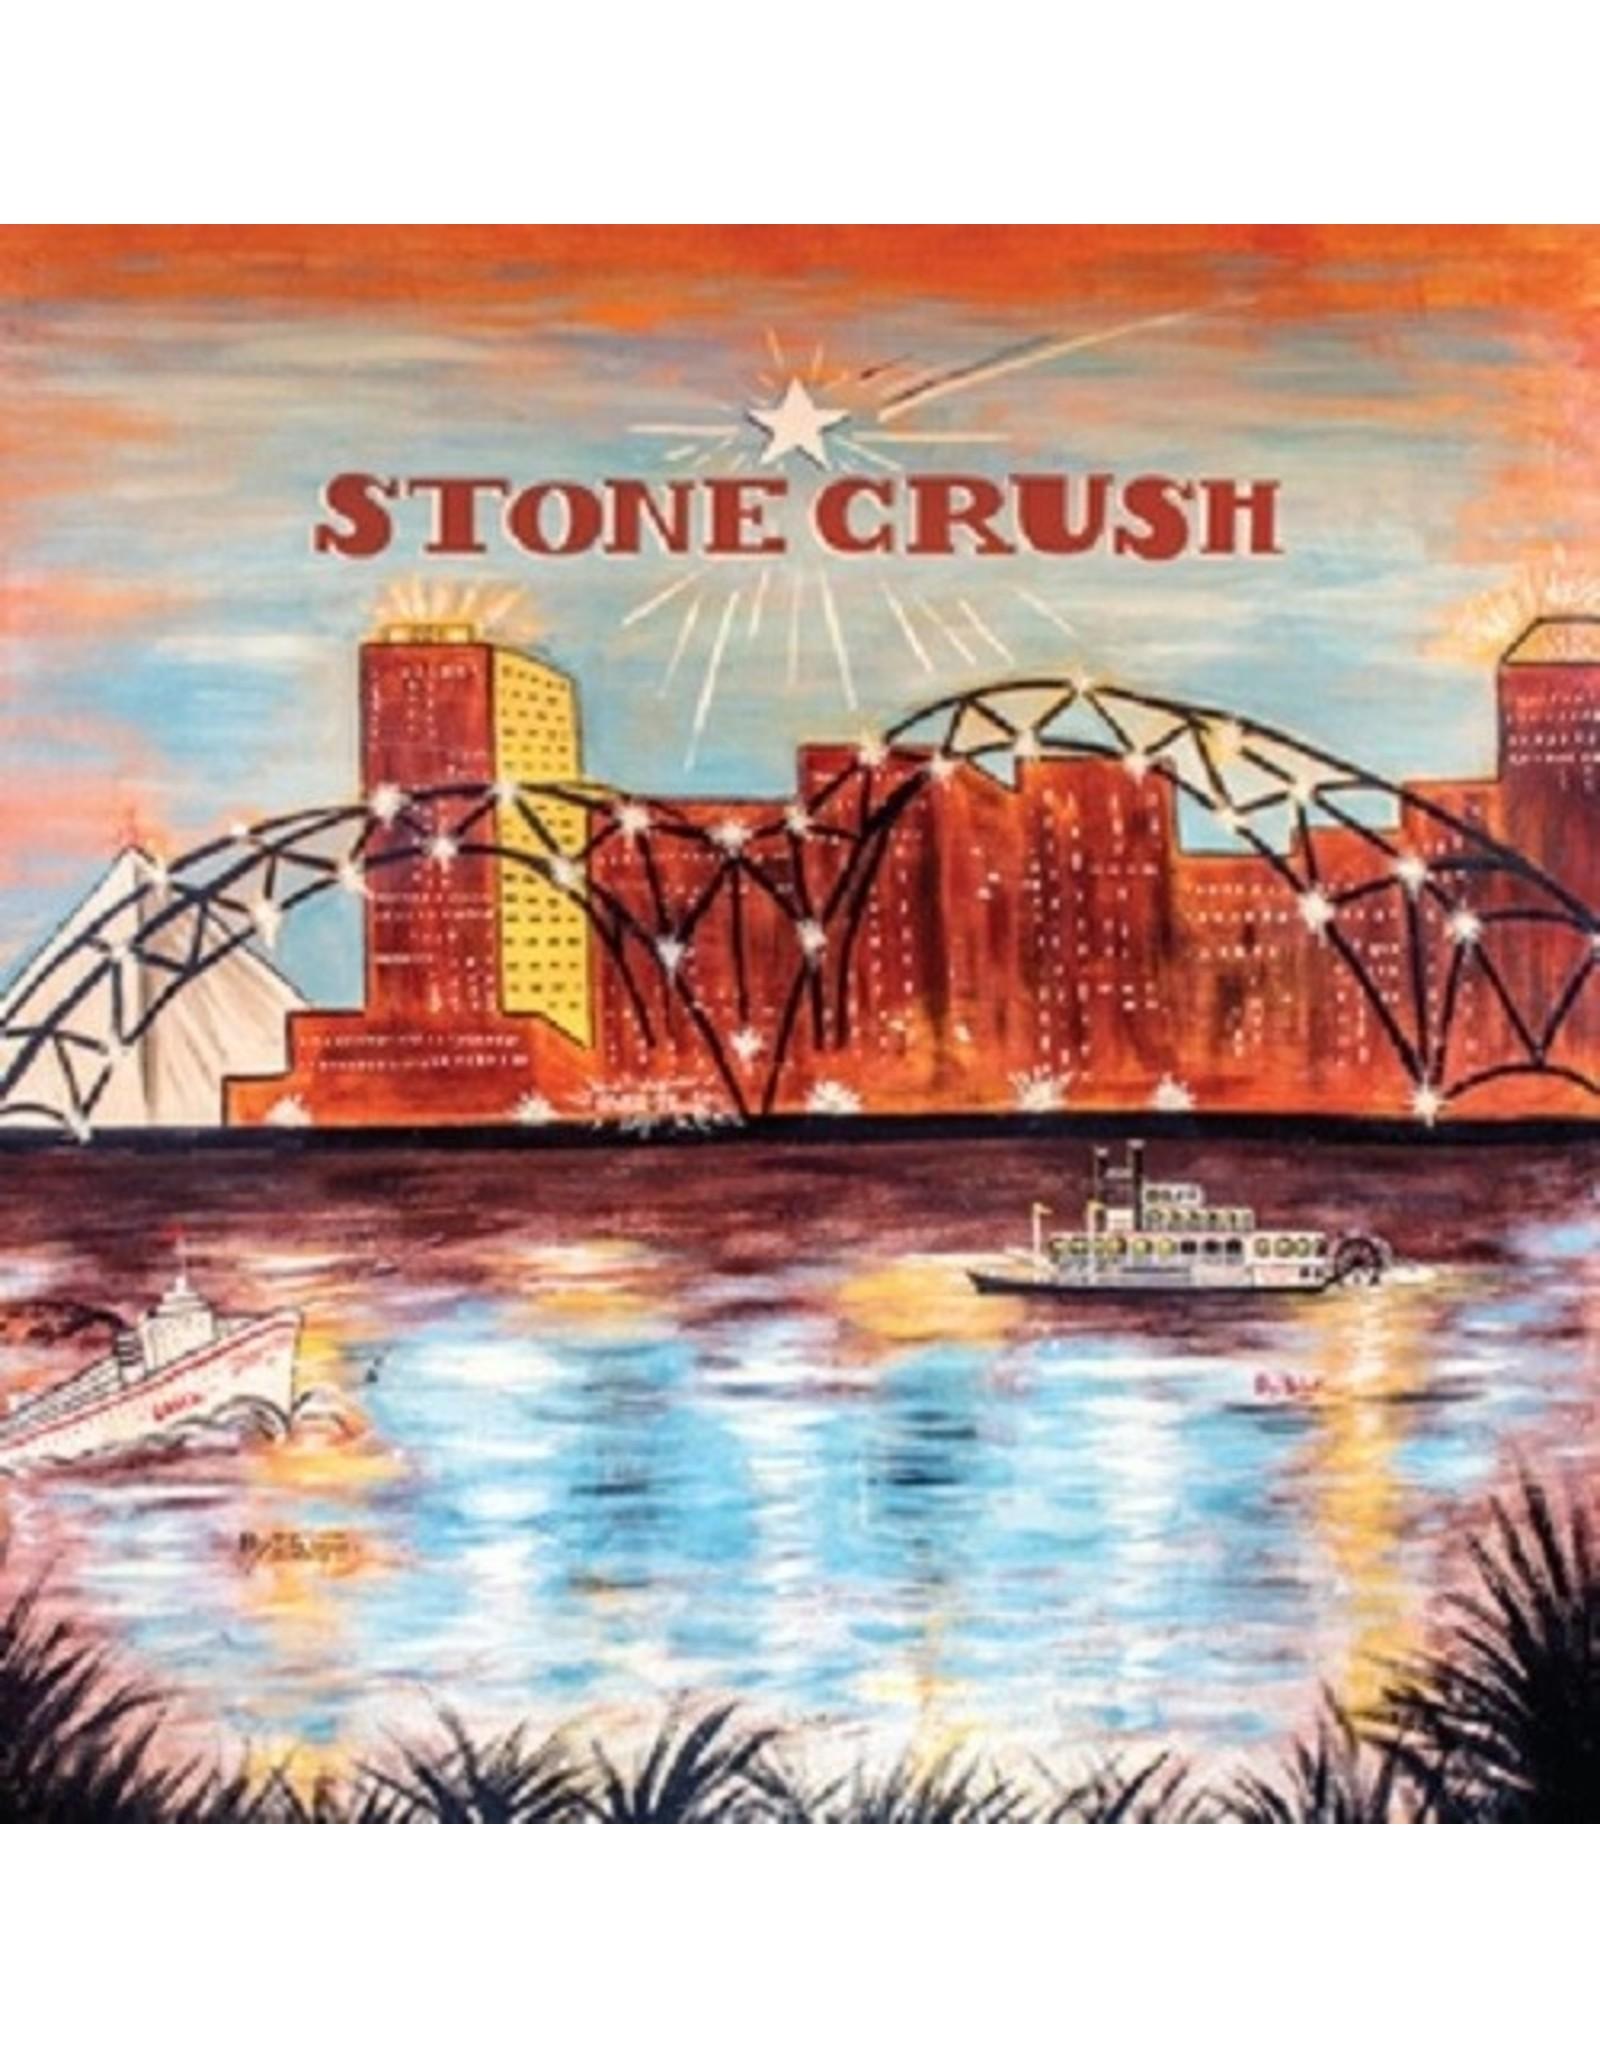 New Vinyl Various - Stone Crush: Memphis Modern Soul 1977-1987 2LP